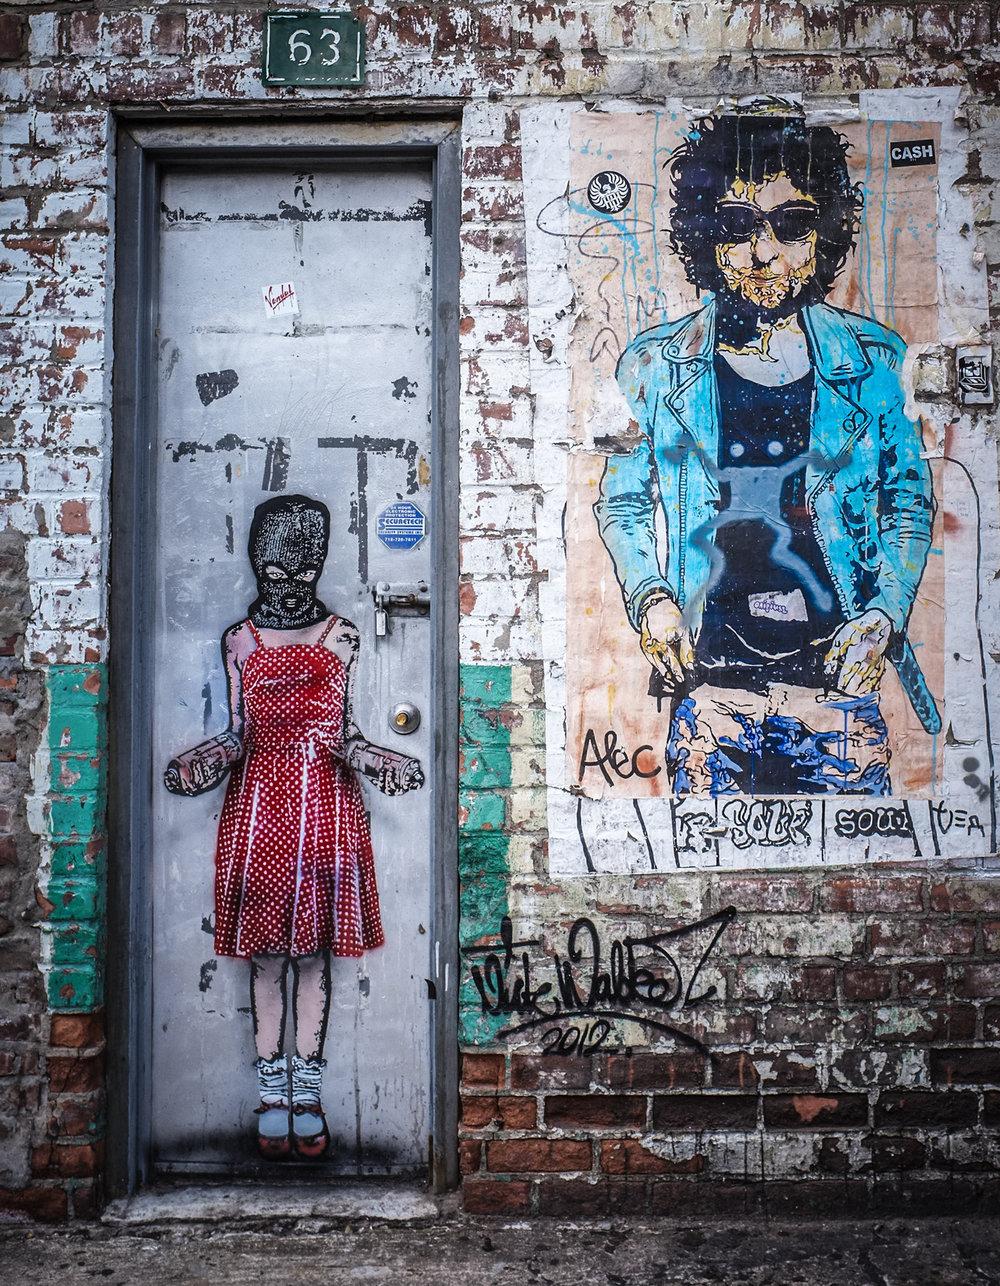 253 - Paint Girl   #366project #FujiX100